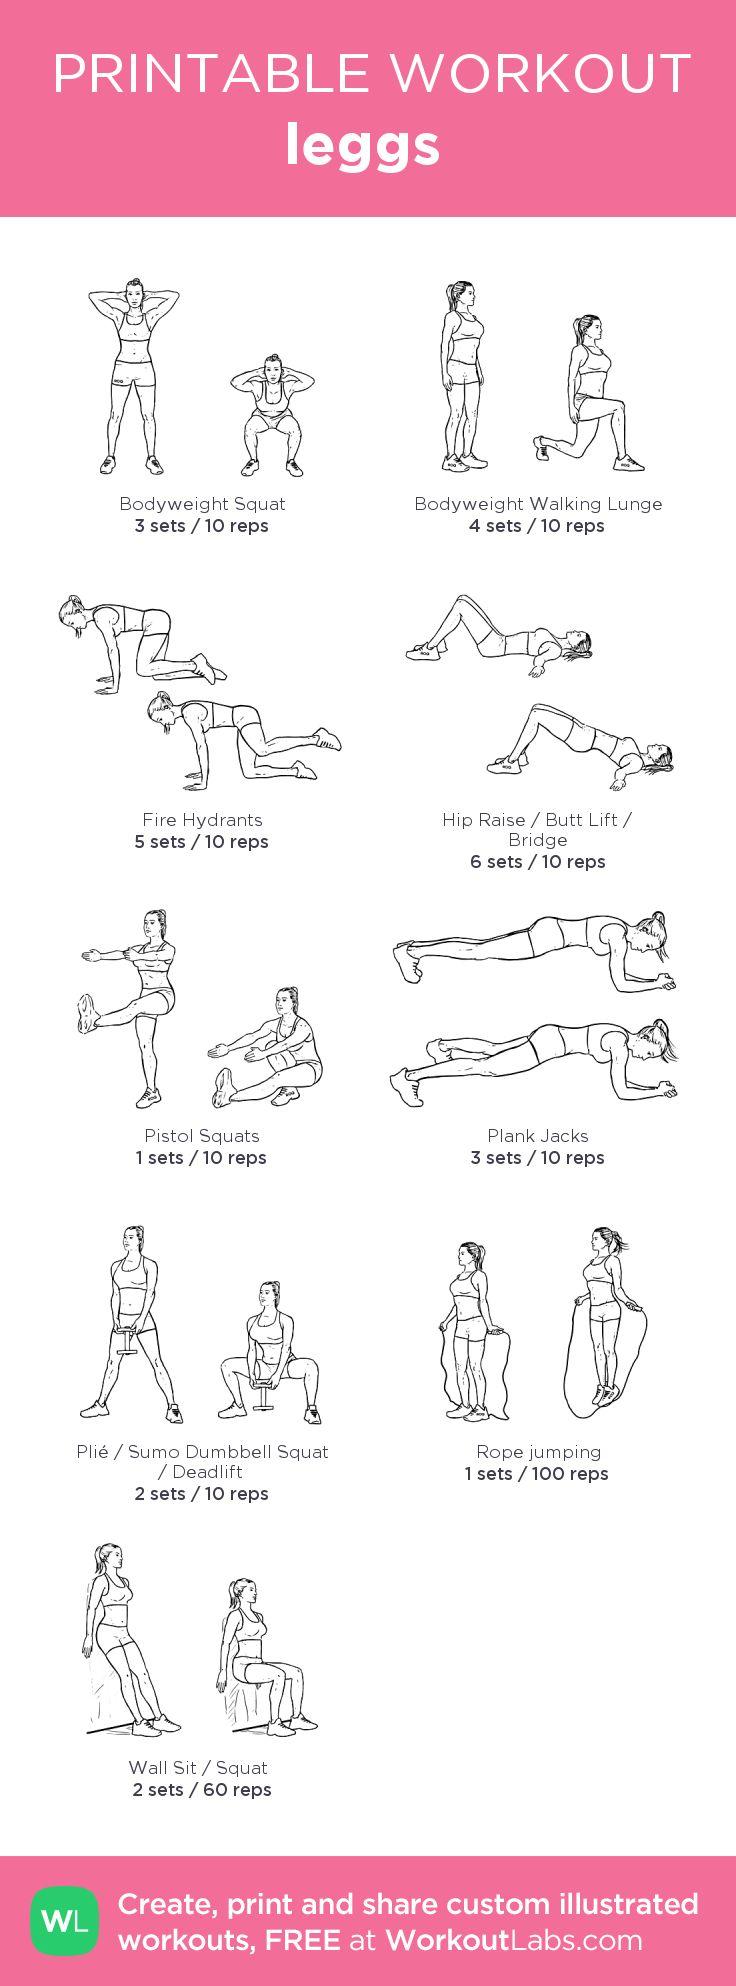 leggs ♥: my custom printable workout by @WorkoutLabs #workoutlabs #customworkout